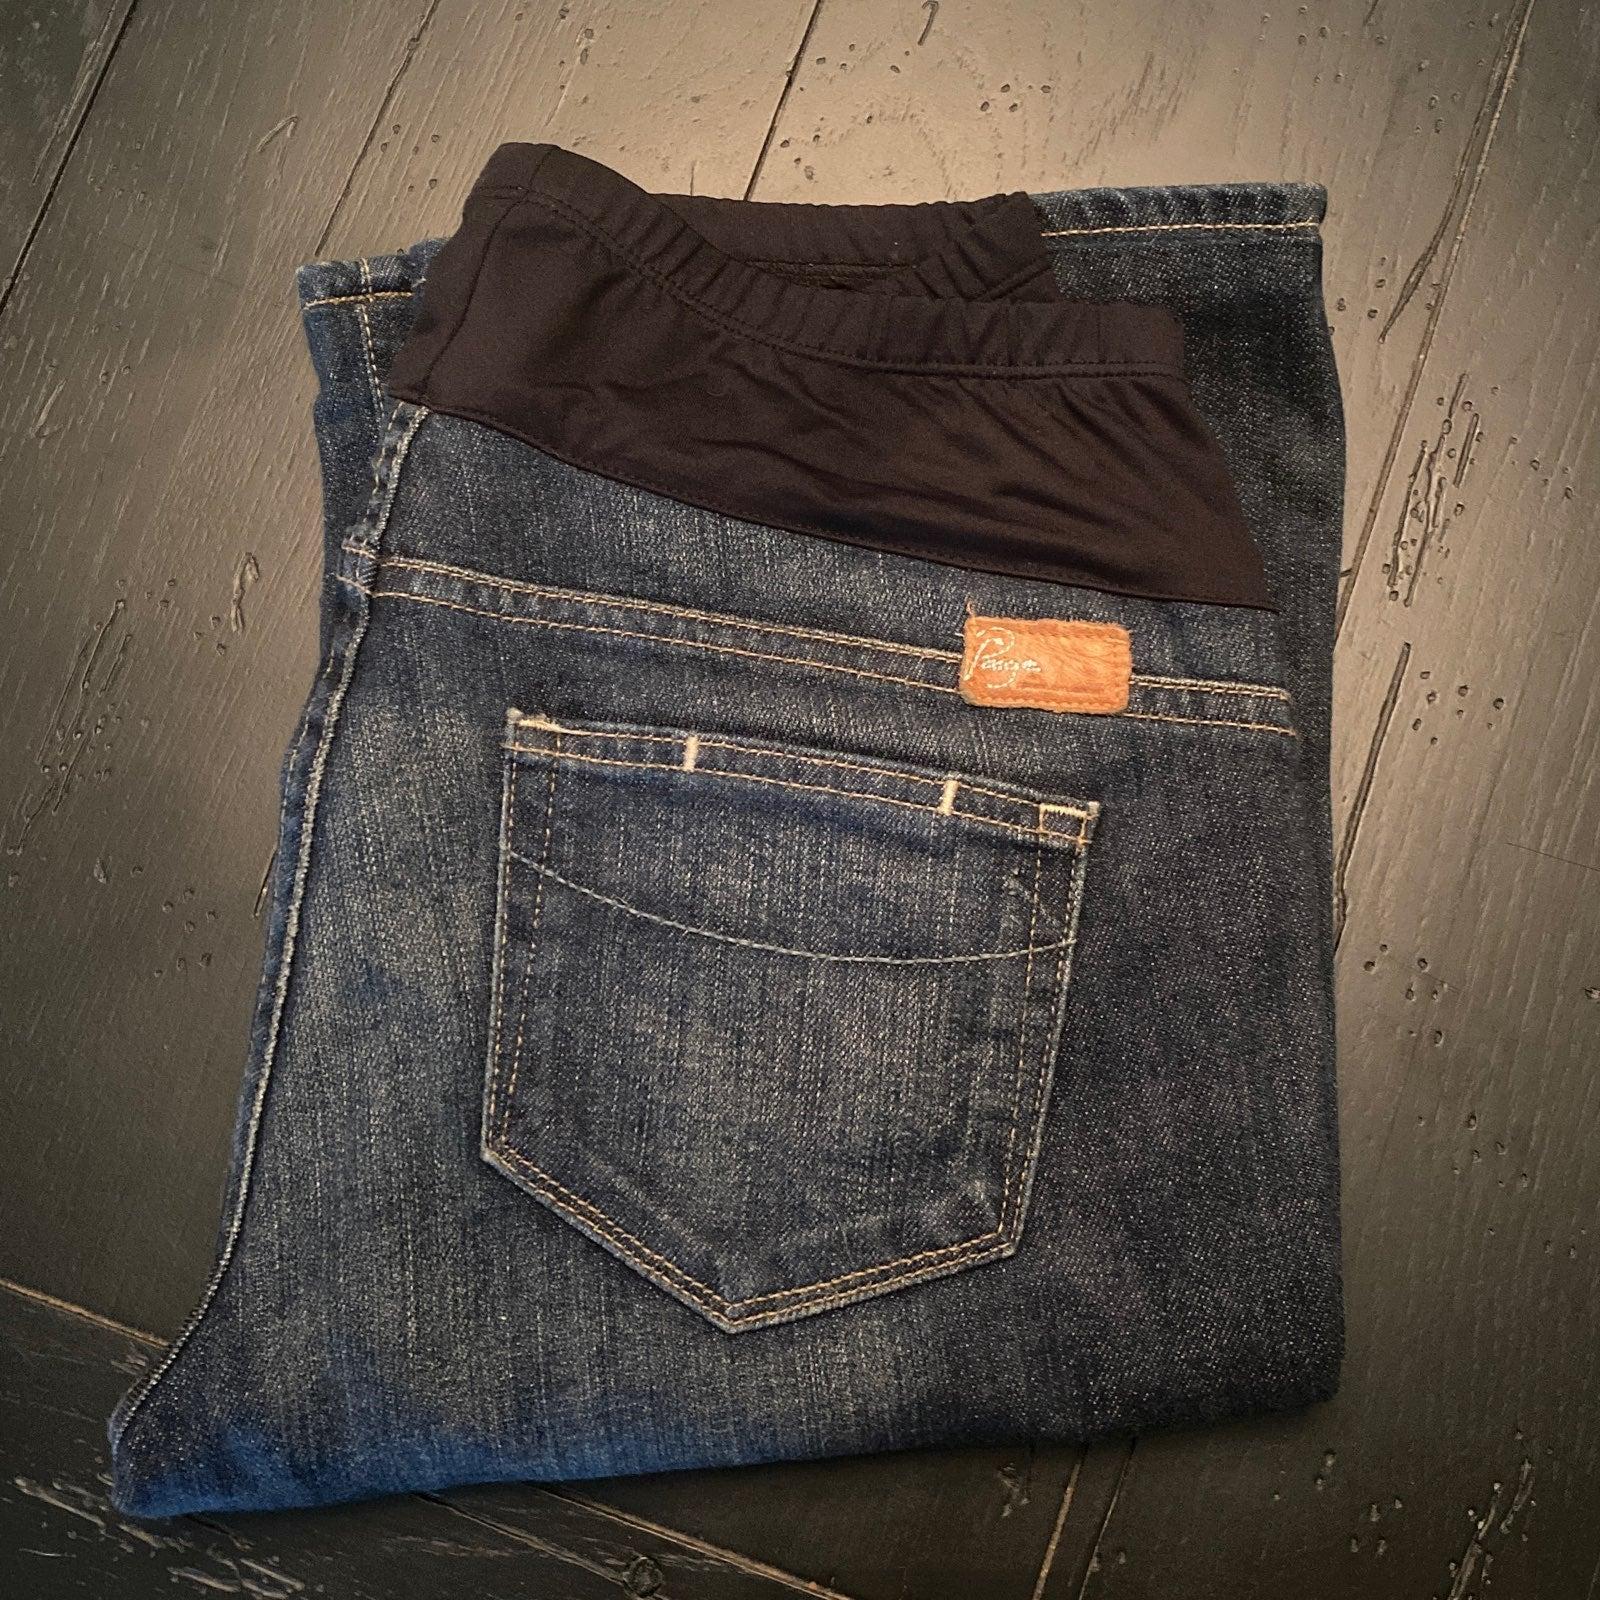 Paige Denim maternity jeans 29 - bootcut